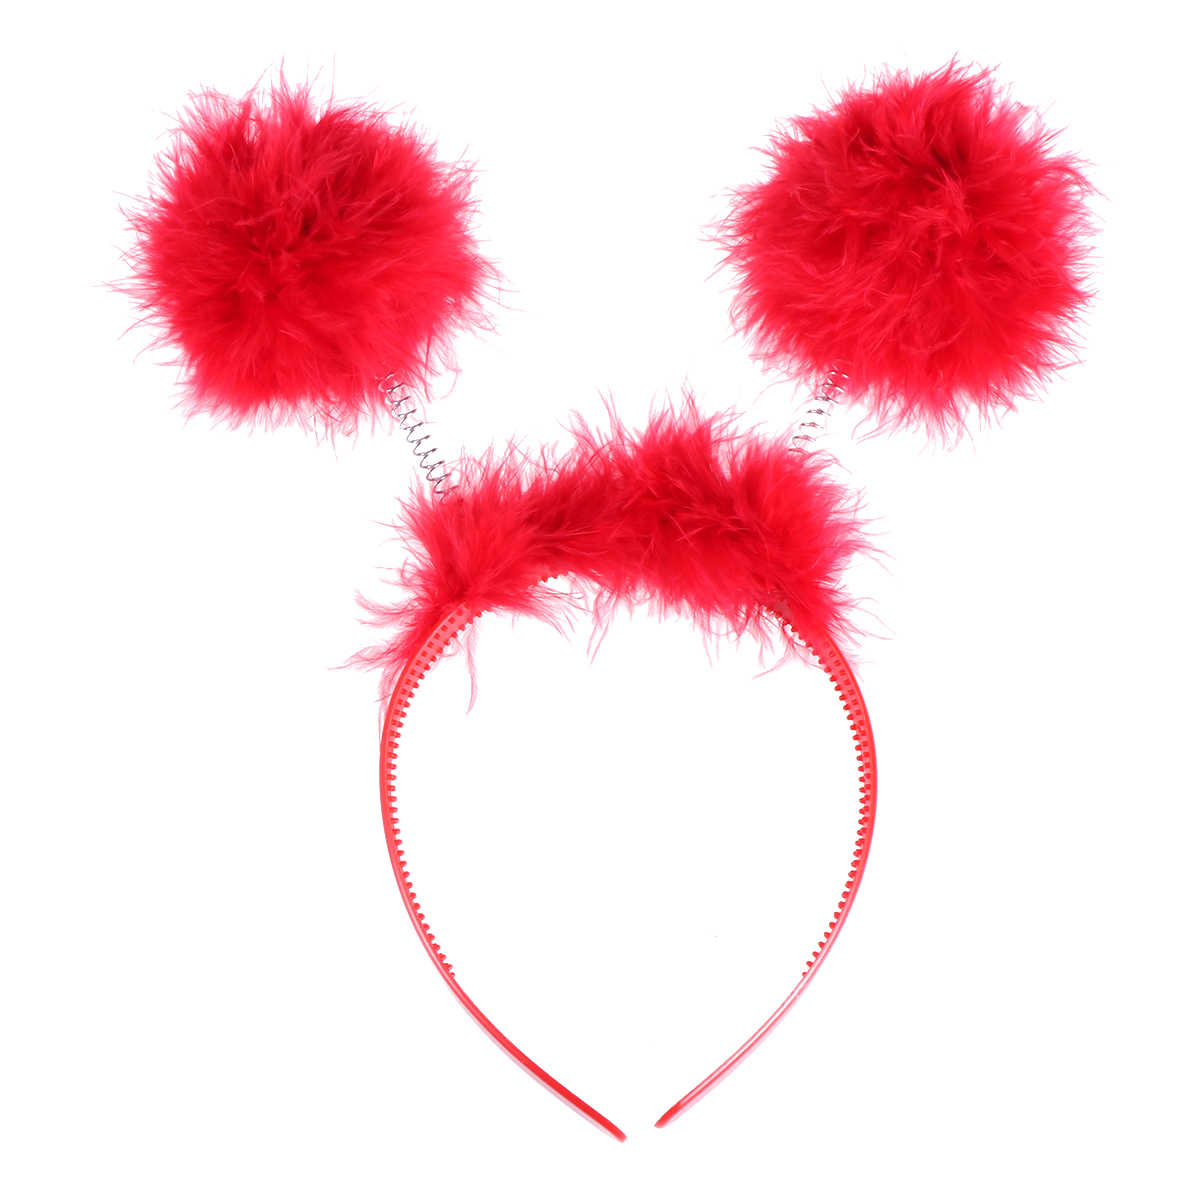 Sweet Girls Cute Ball Headband Hoop Cat Ears Hairband Tiara Hair Accessories For Performance Costume Party Masquerade